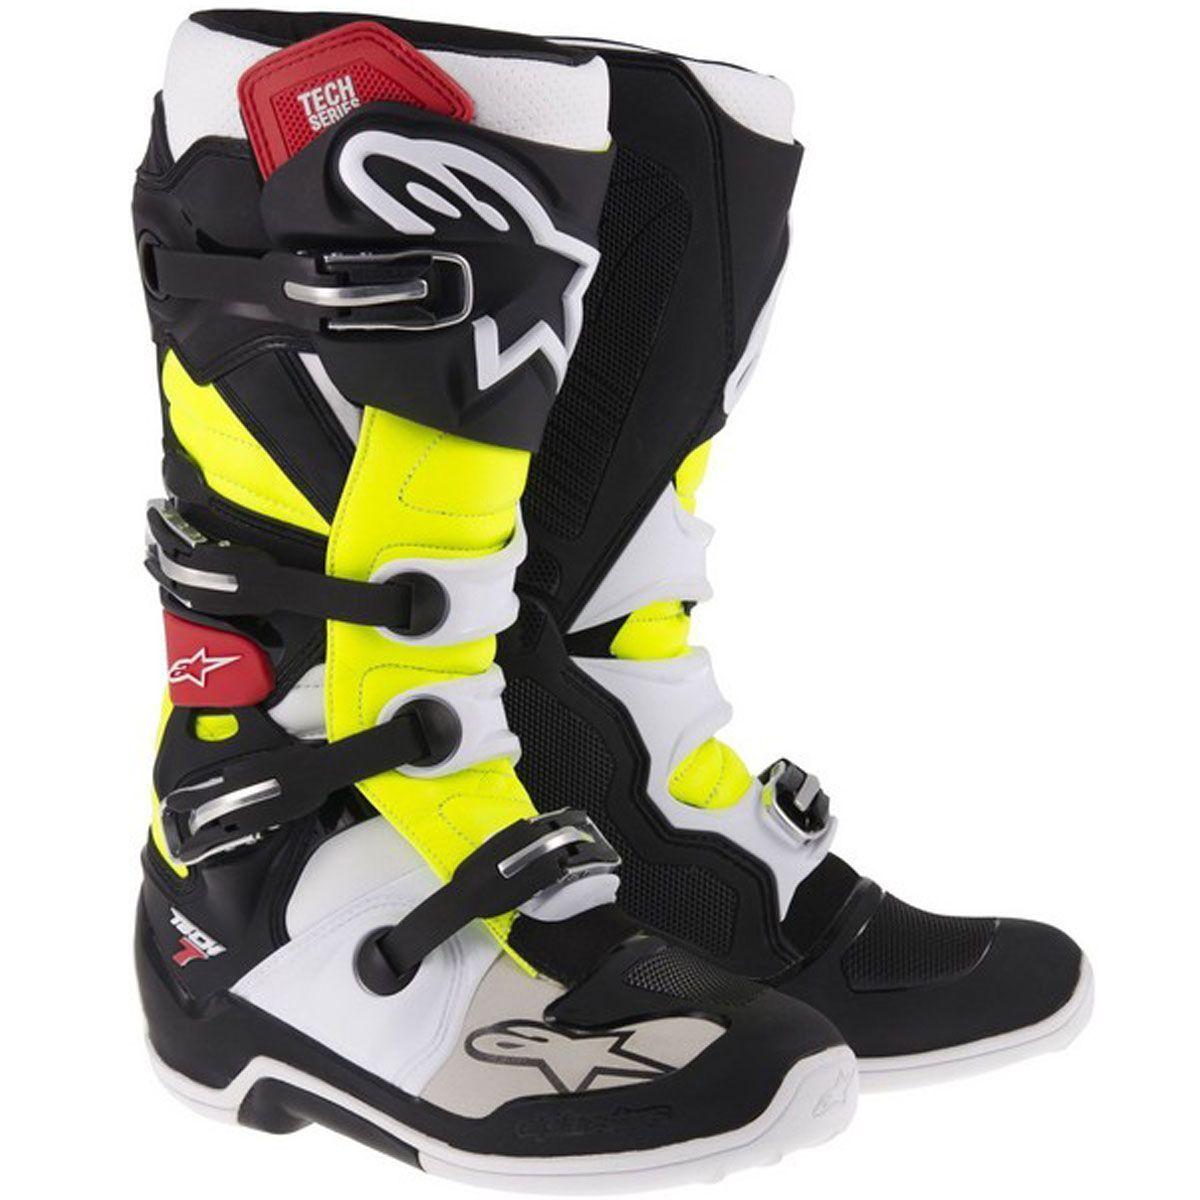 Alpinestars Motocross-Stiefel Tech 7 Schwarz